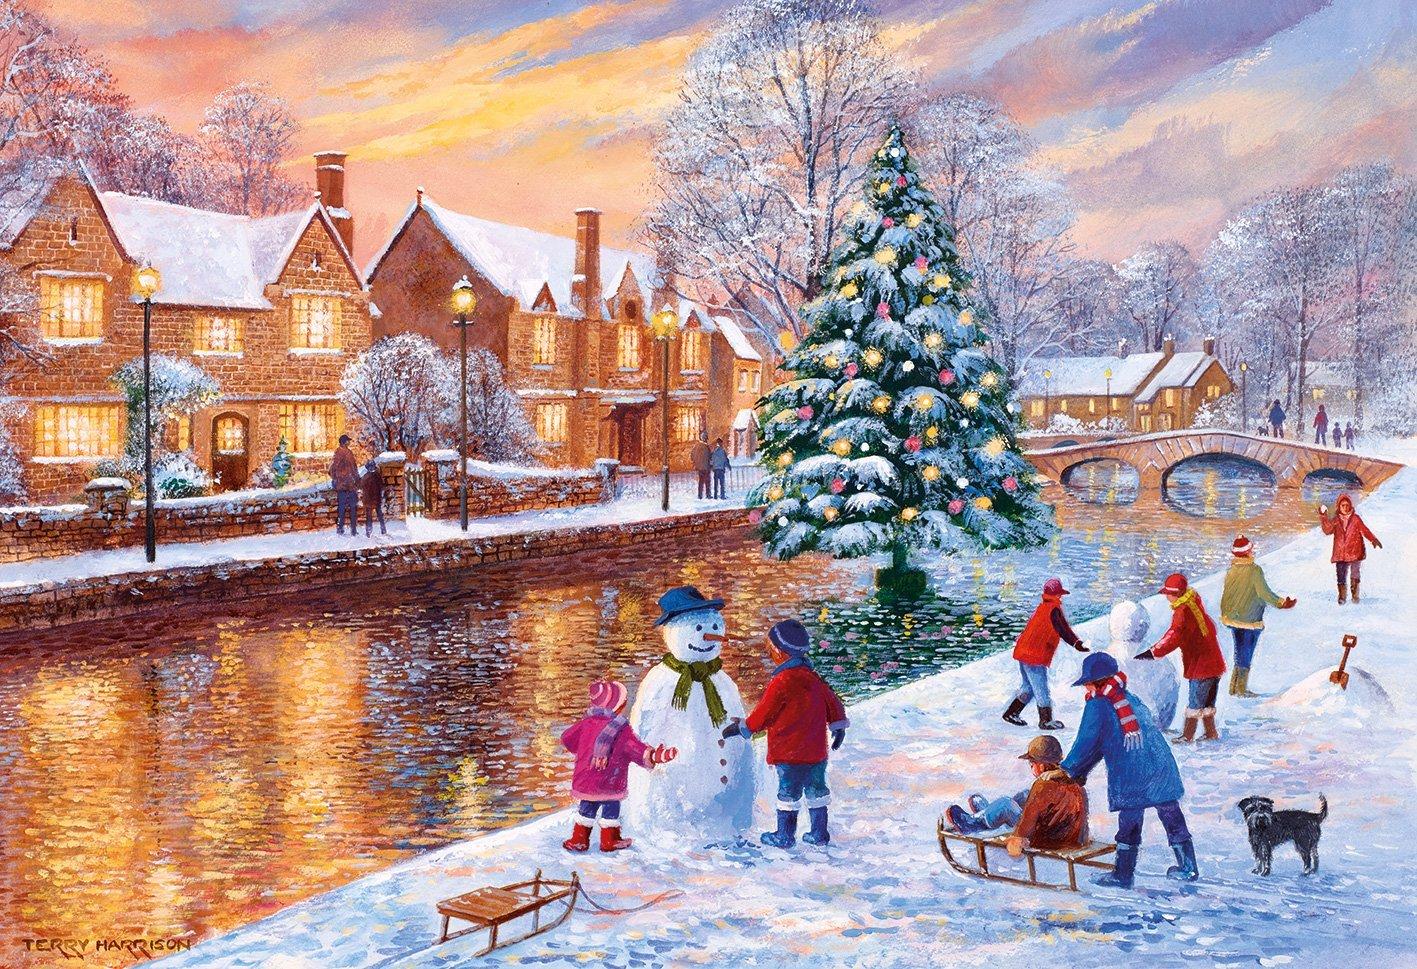 terry-harrison-bourton-at-christmas